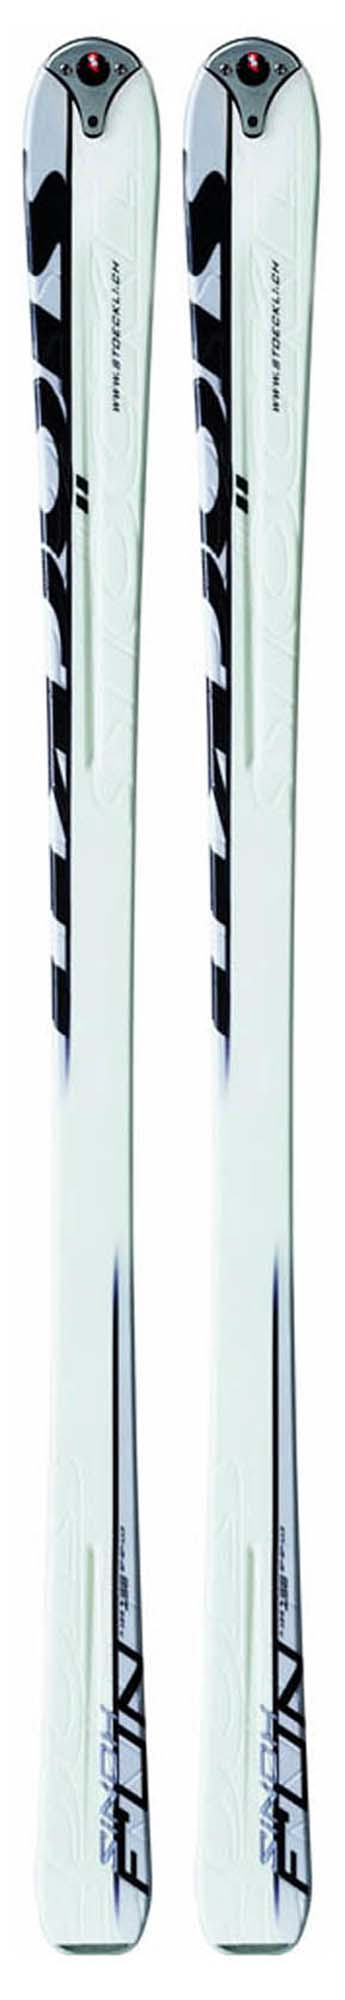 Stockli 2006 Sinox Fun Skis (No Bindings / Flat) NEW !!  170cm